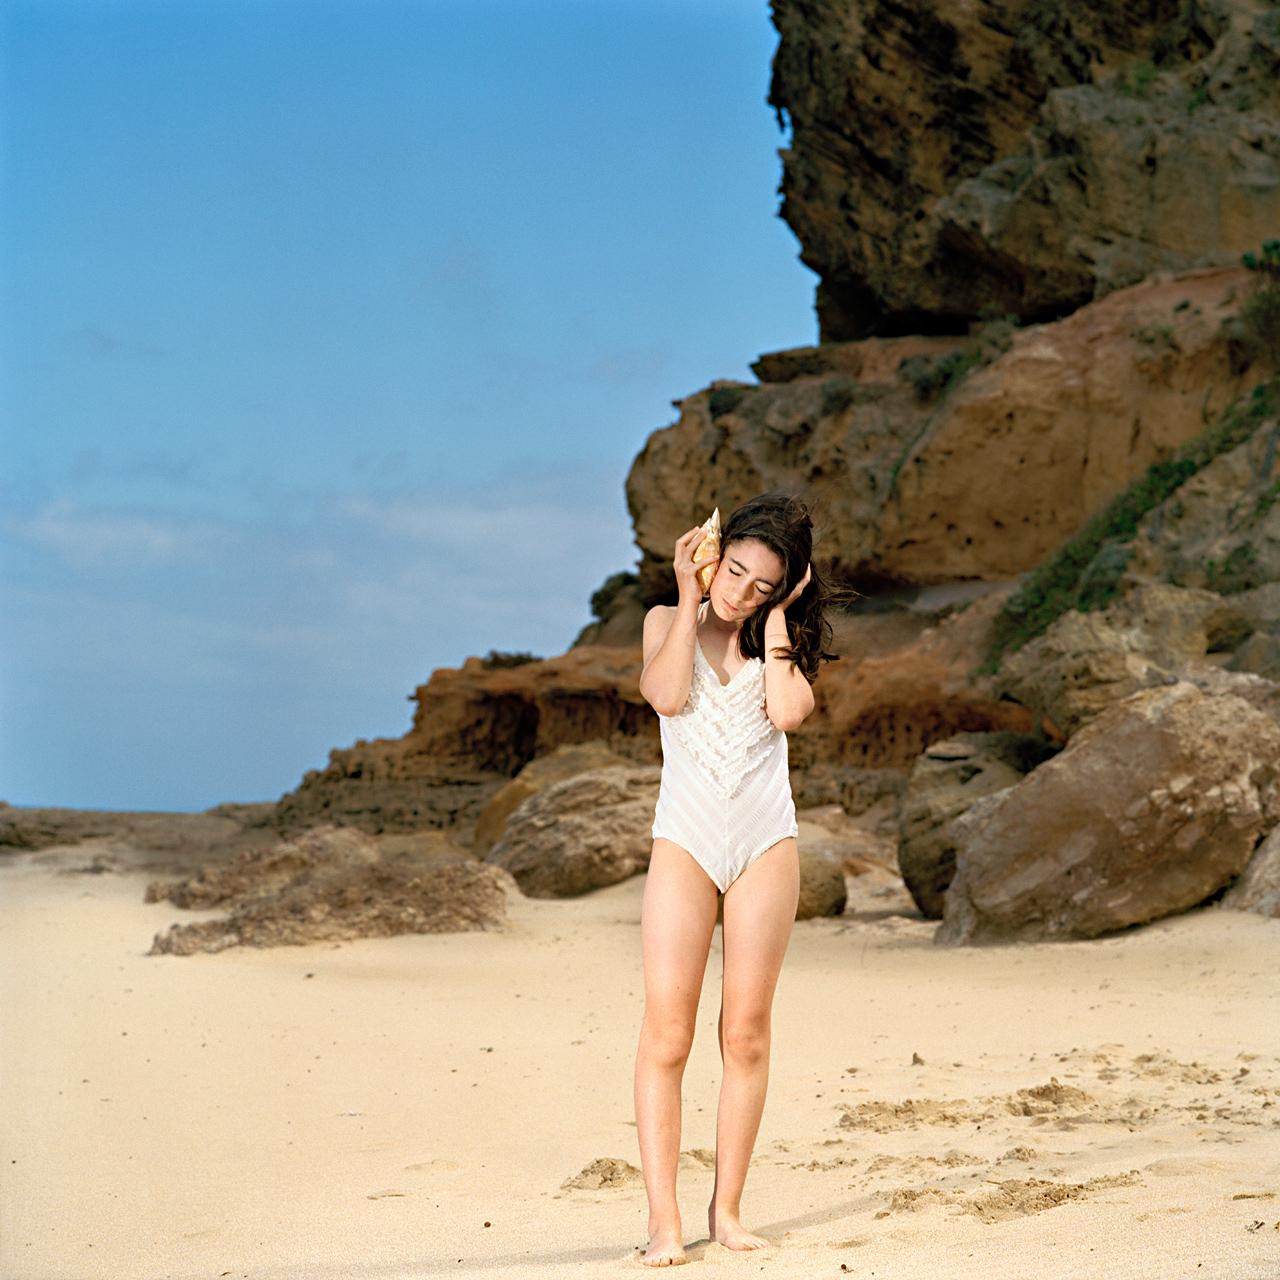 Song to the siren 2008 | Polixeni Papapetrou